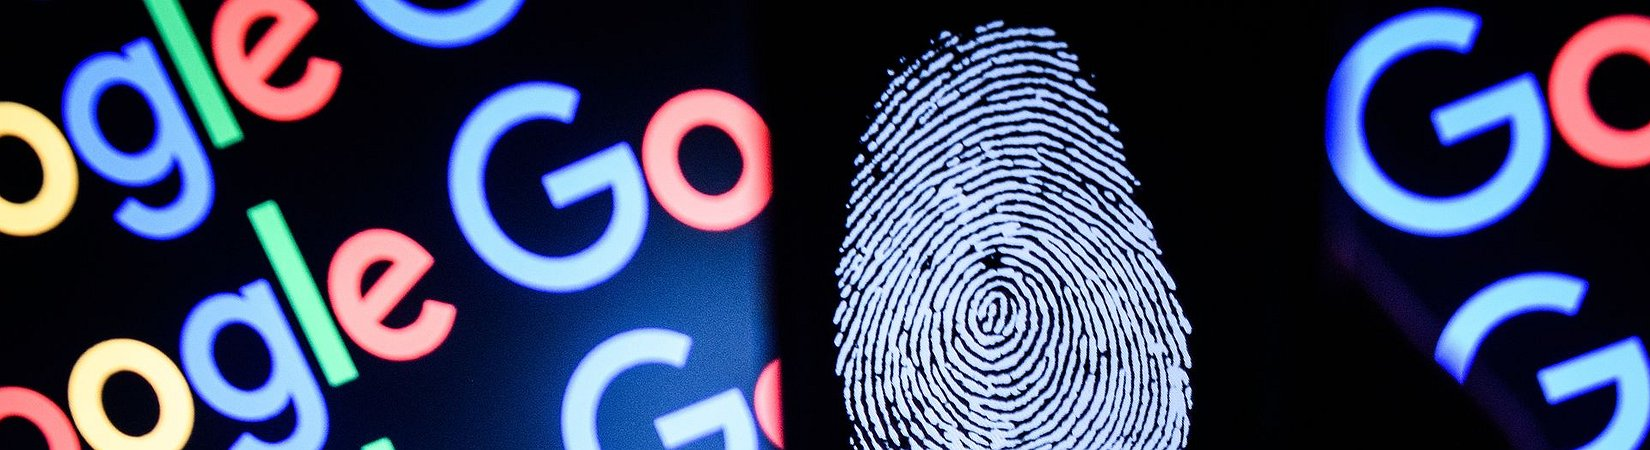 Alphabet lançou segmento para proteger as empresas de hackers